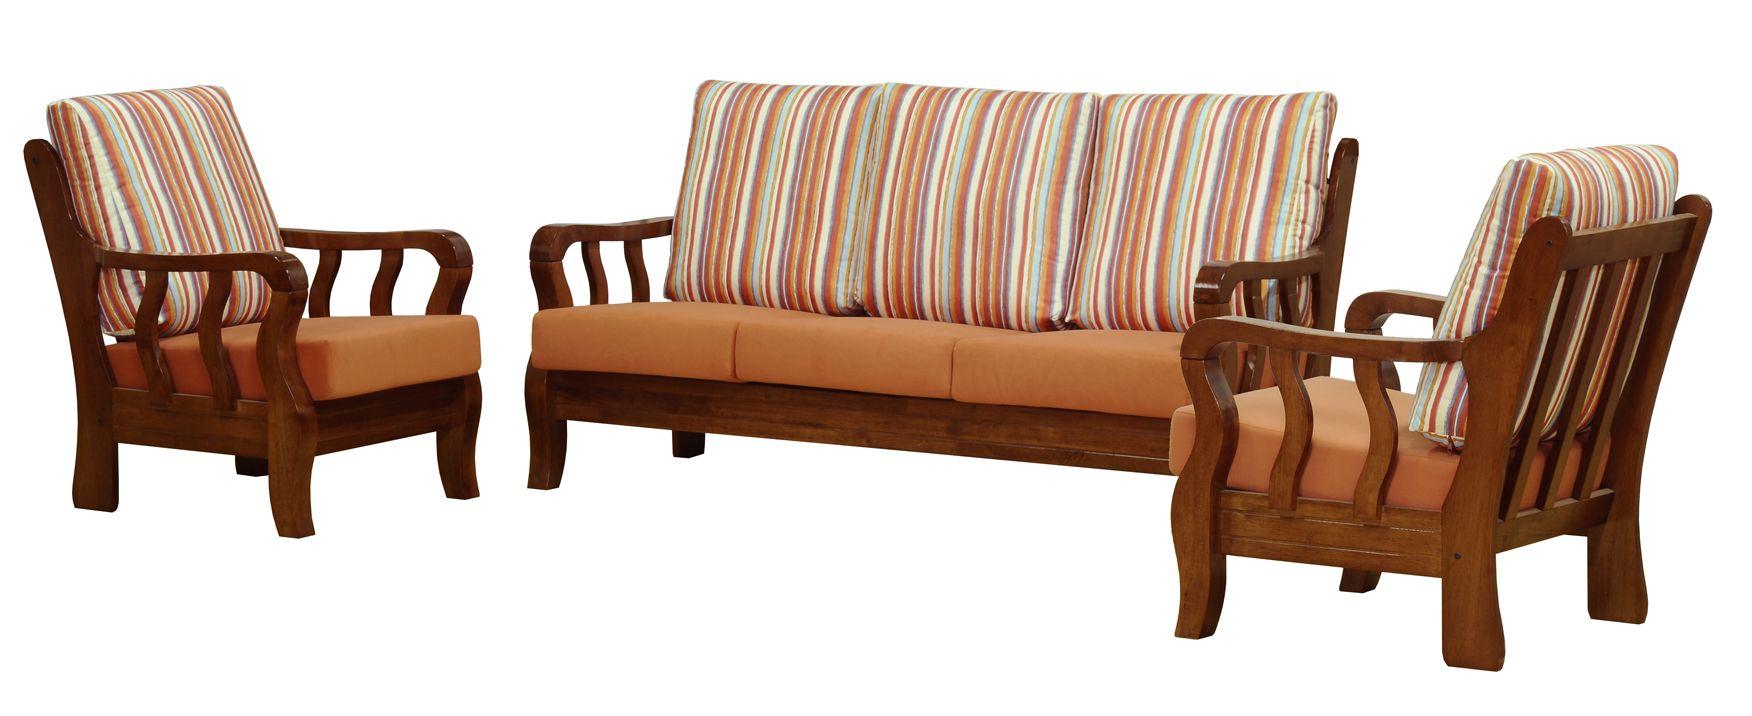 Pin By Himalaya Furniture On Sofa Set Wood Sofa Wooden Sofa Set Designs Sofa Design